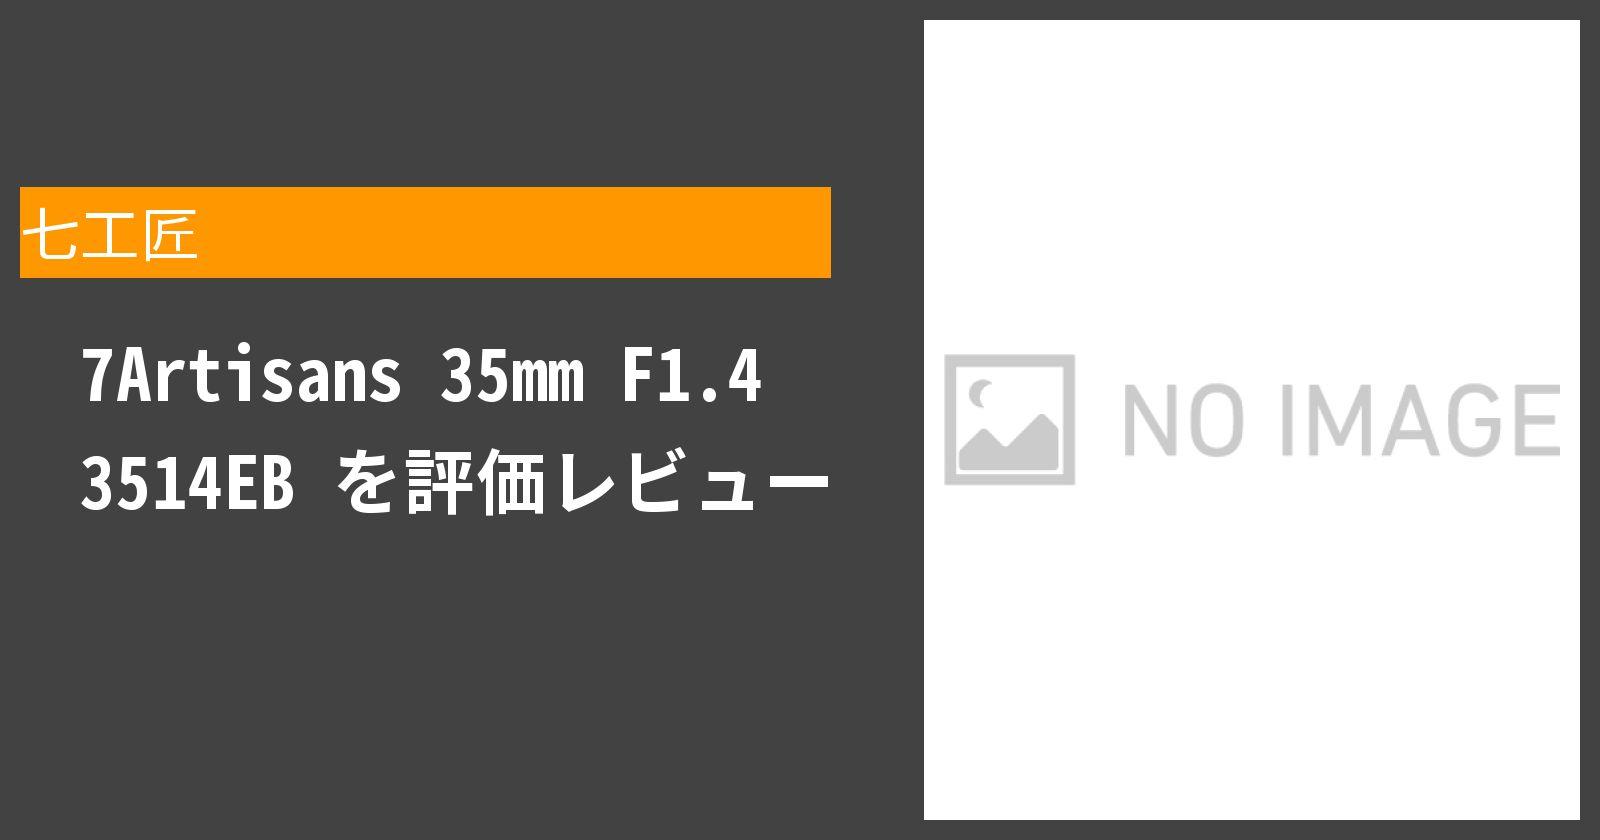 7Artisans 35mm F1.4 3514EBを徹底評価